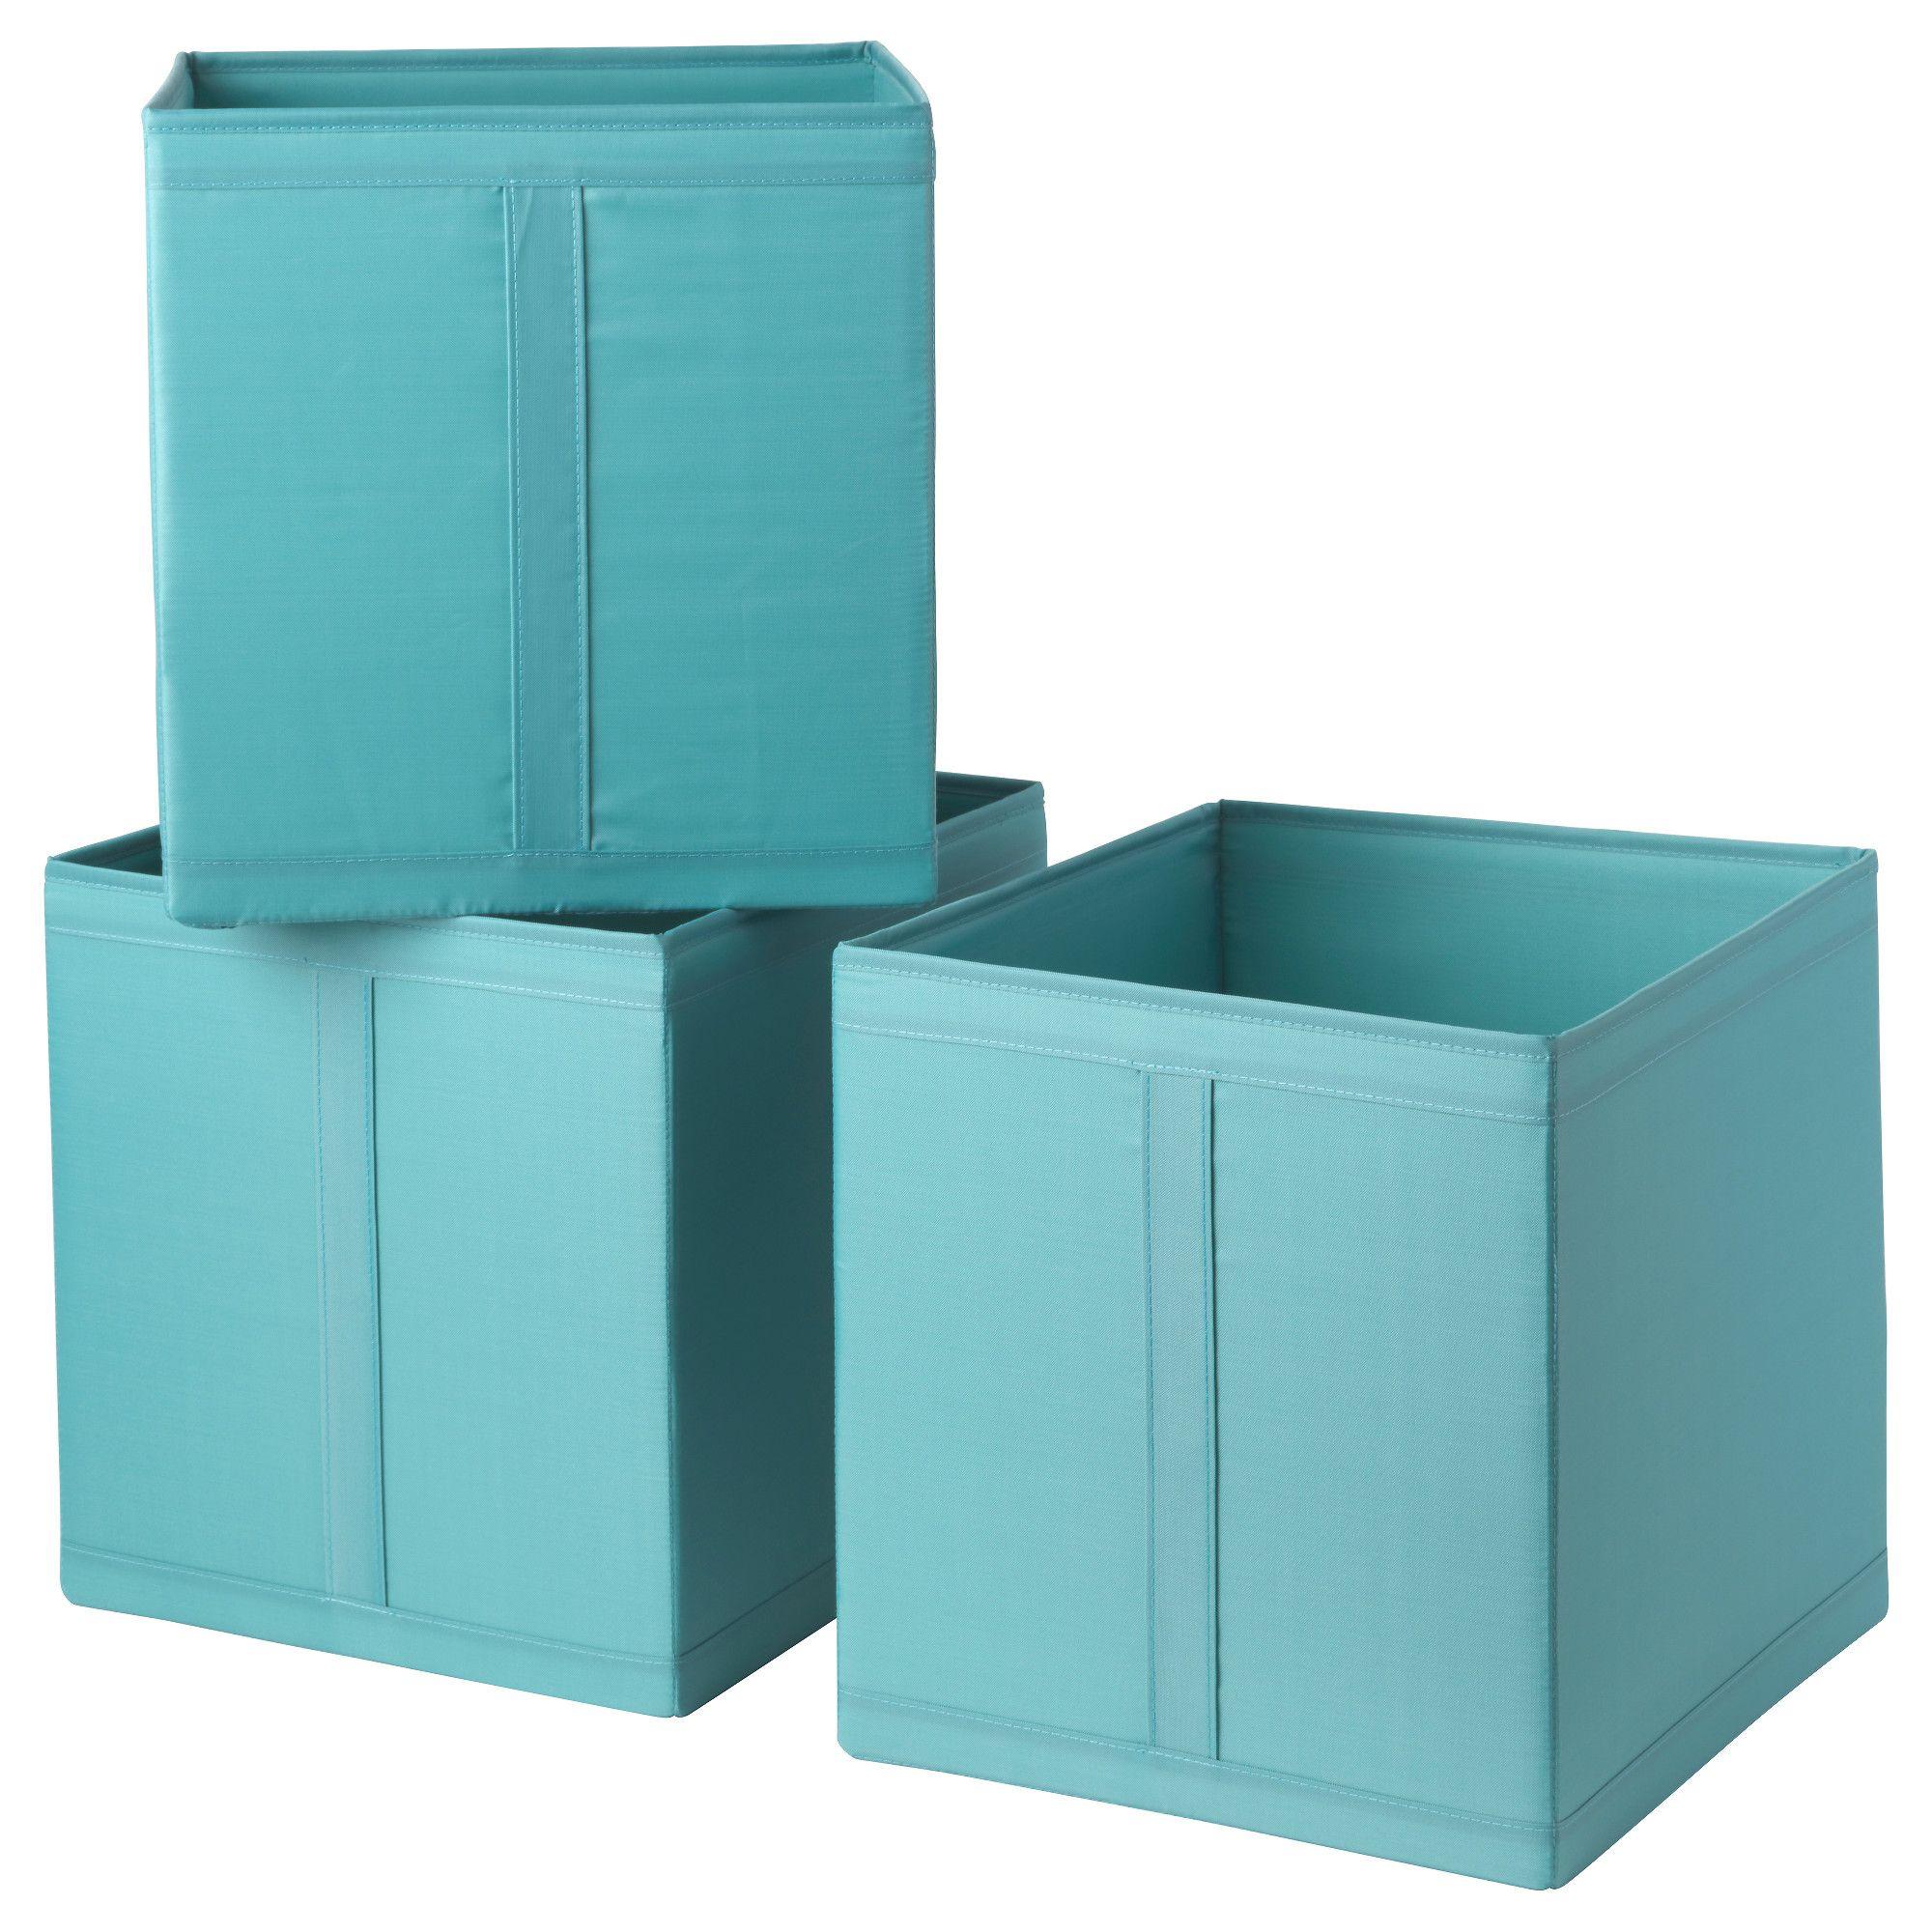 Skubb Caja Azul Claro 31 X 34 X 33 Cm Products Pinterest Cajas